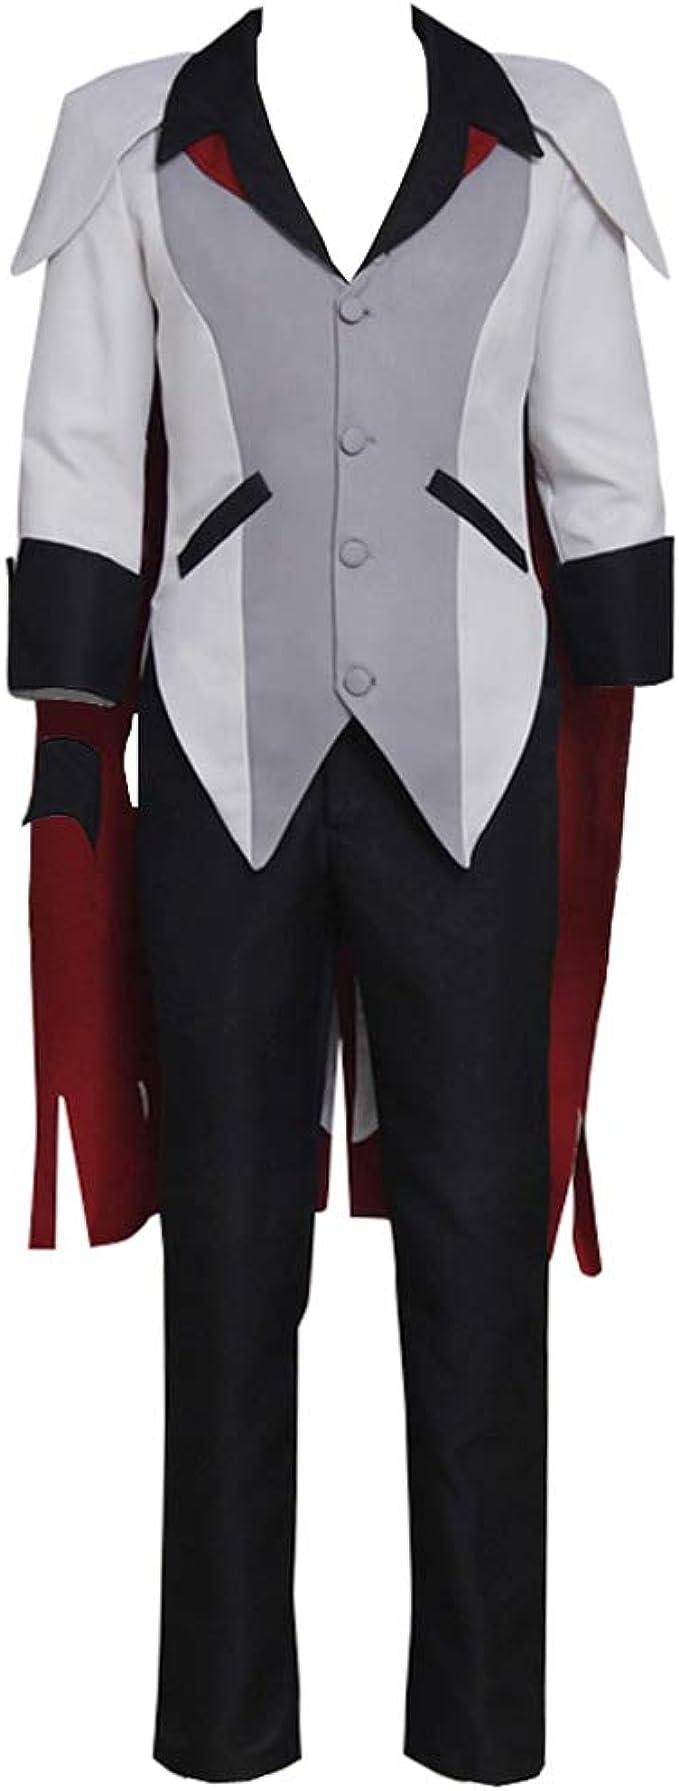 Amazon.com: cosplaydiy hombre traje para RWBY qrow Branwen ...